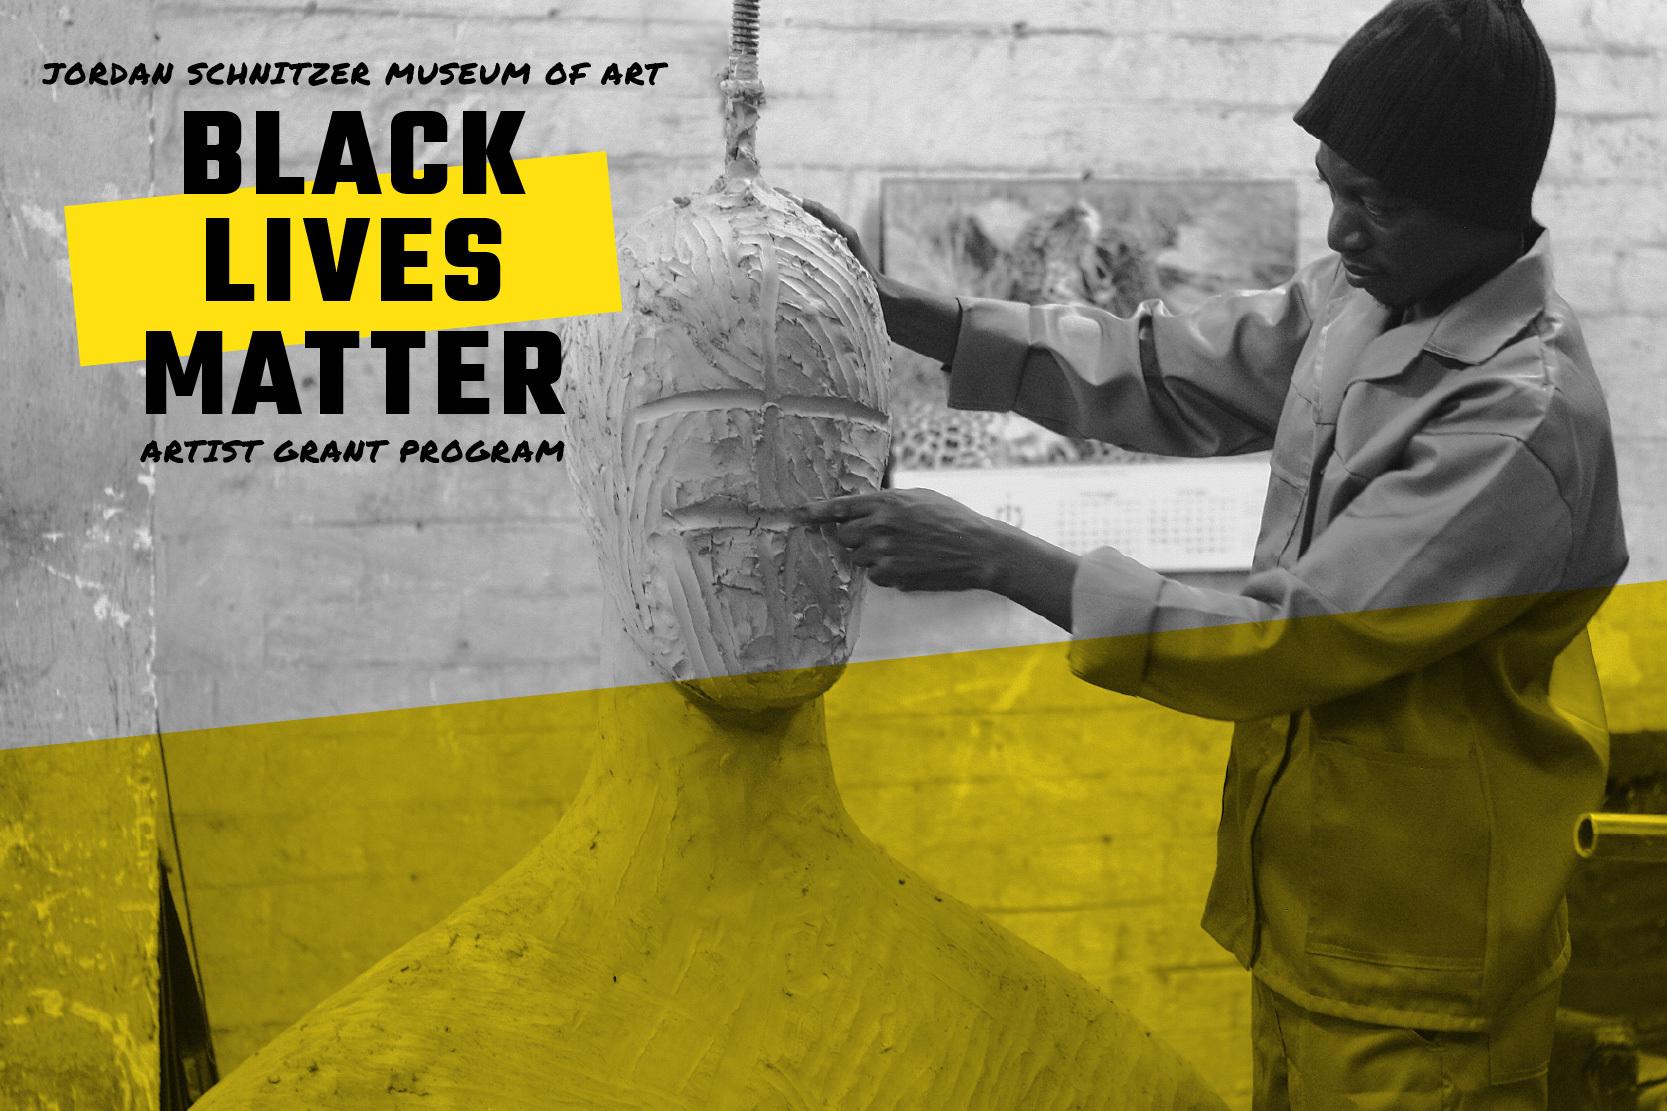 Jordan Schnitzer Museum of Art Black Lives Matter Artist Grant Program 2020 (up to $150,000)